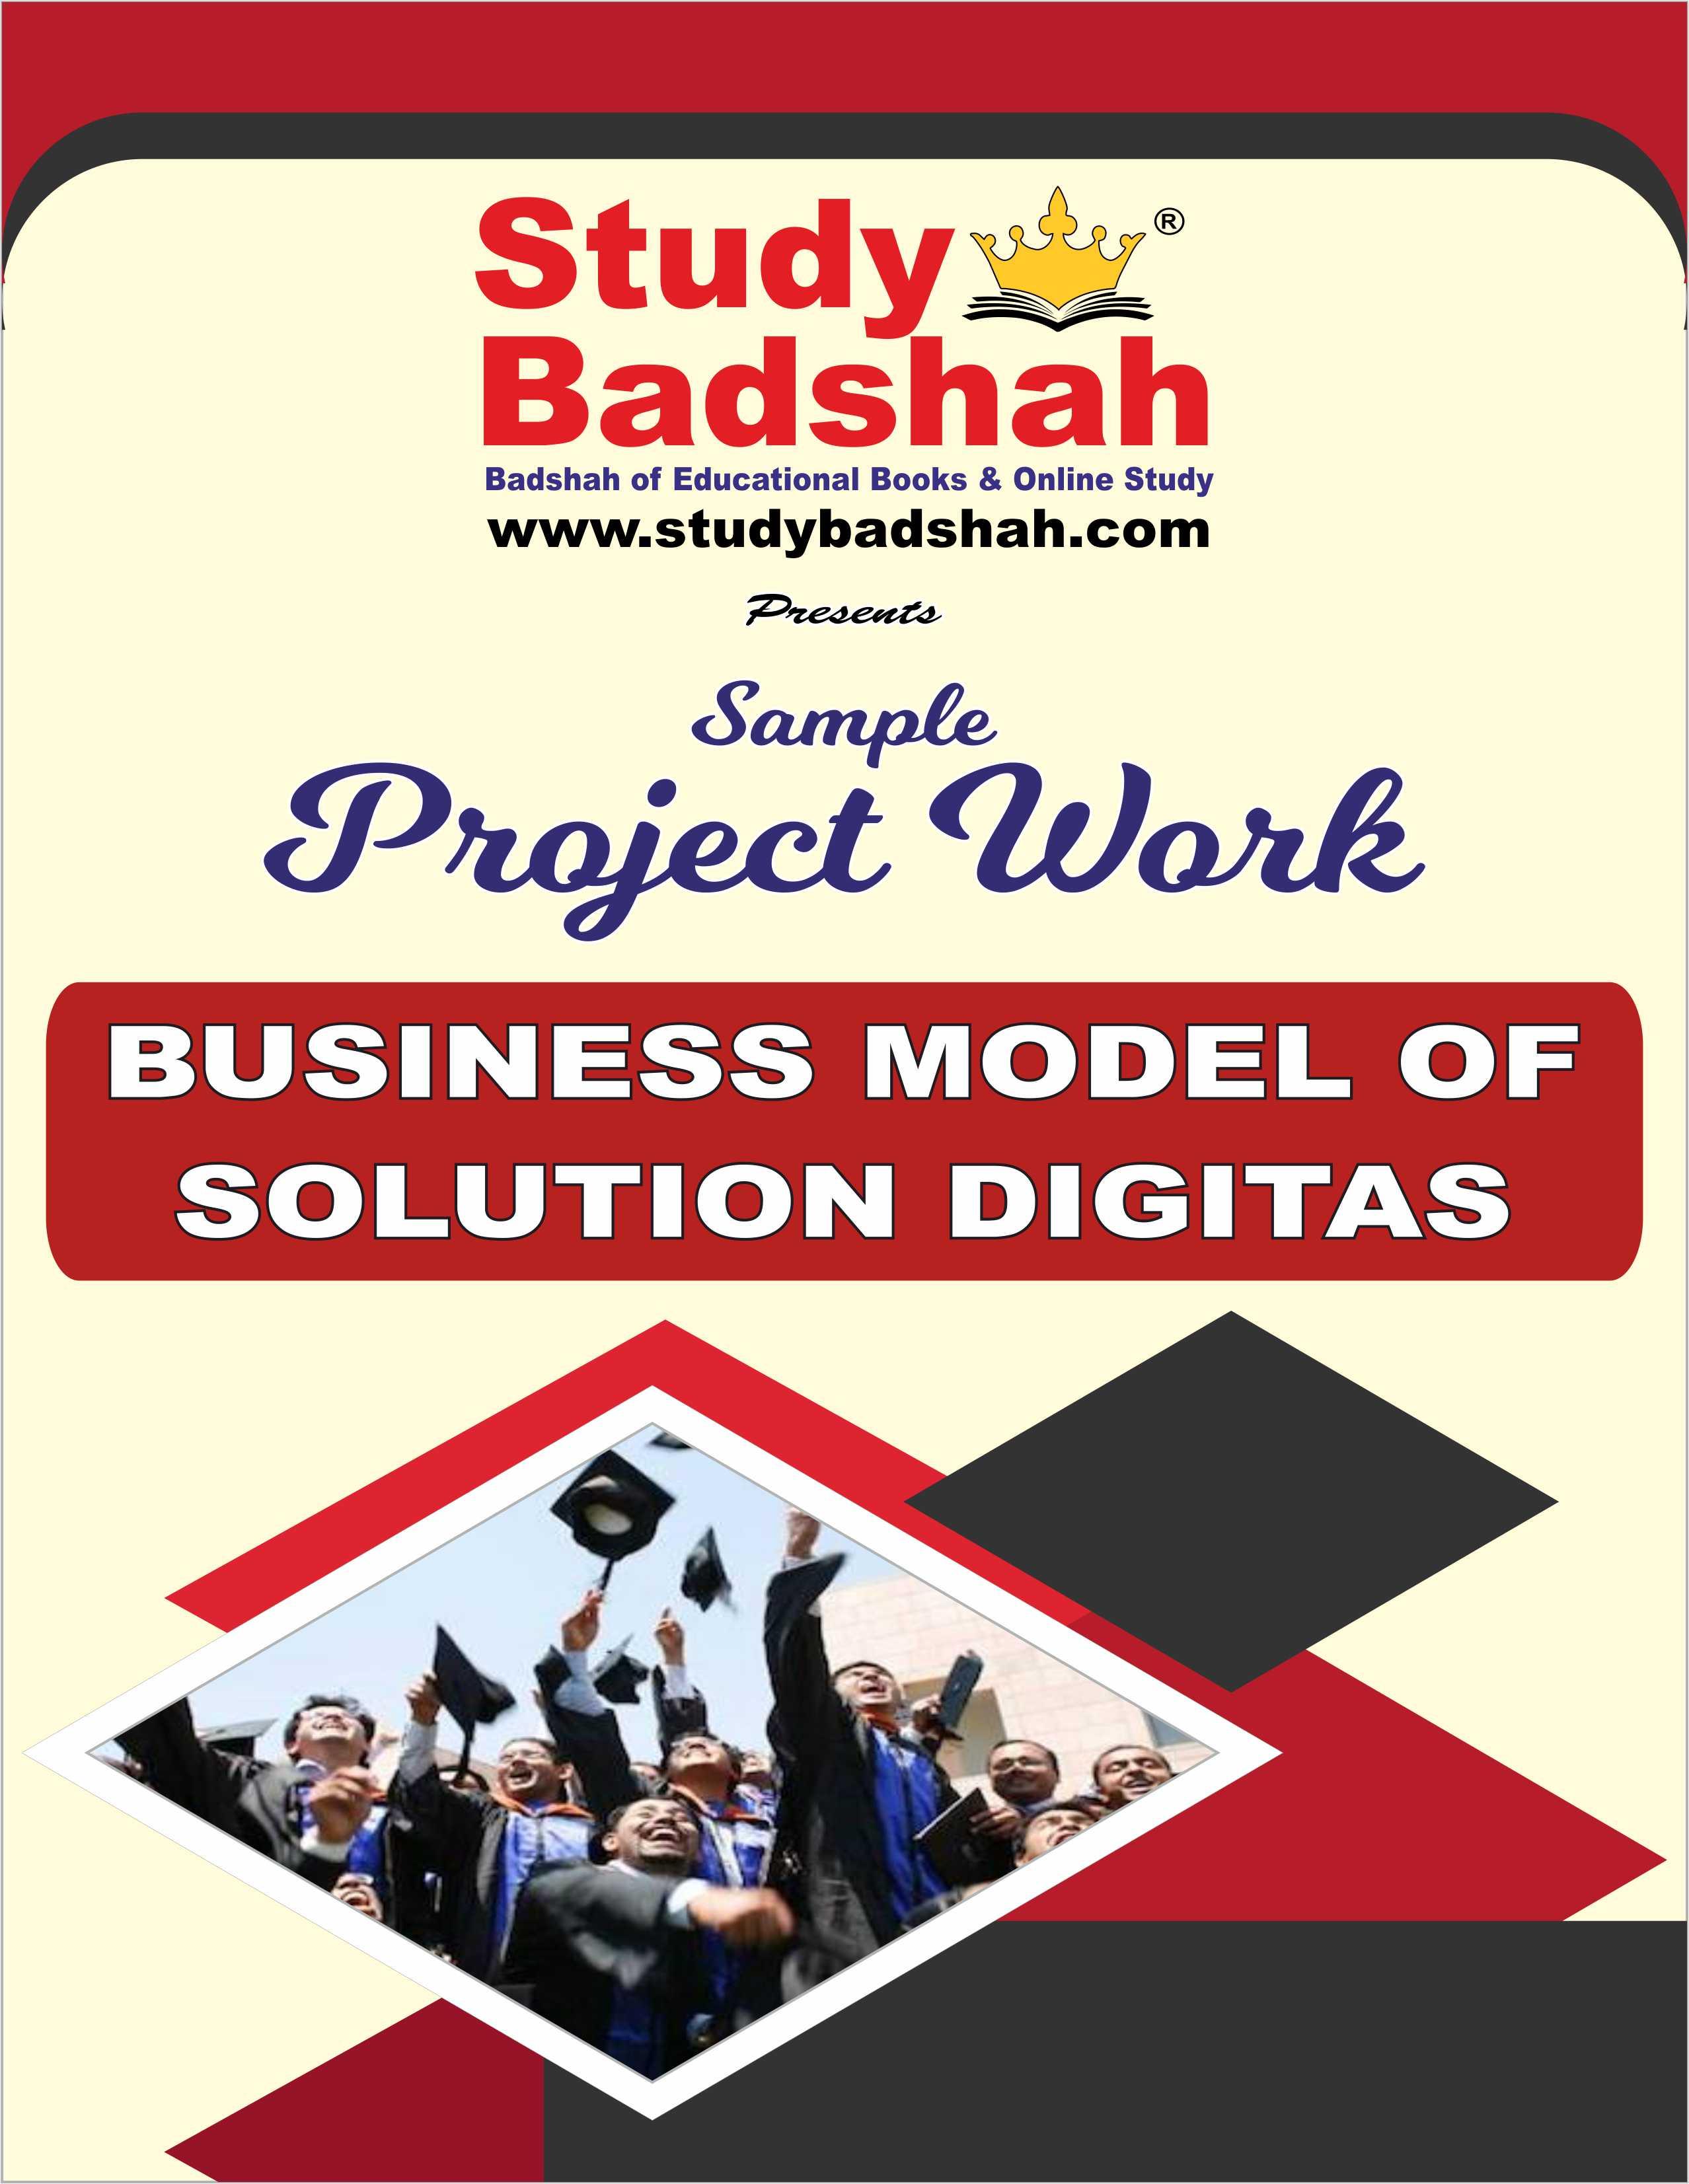 BUSINESS MODEL OF SOLUTION DIGITAS